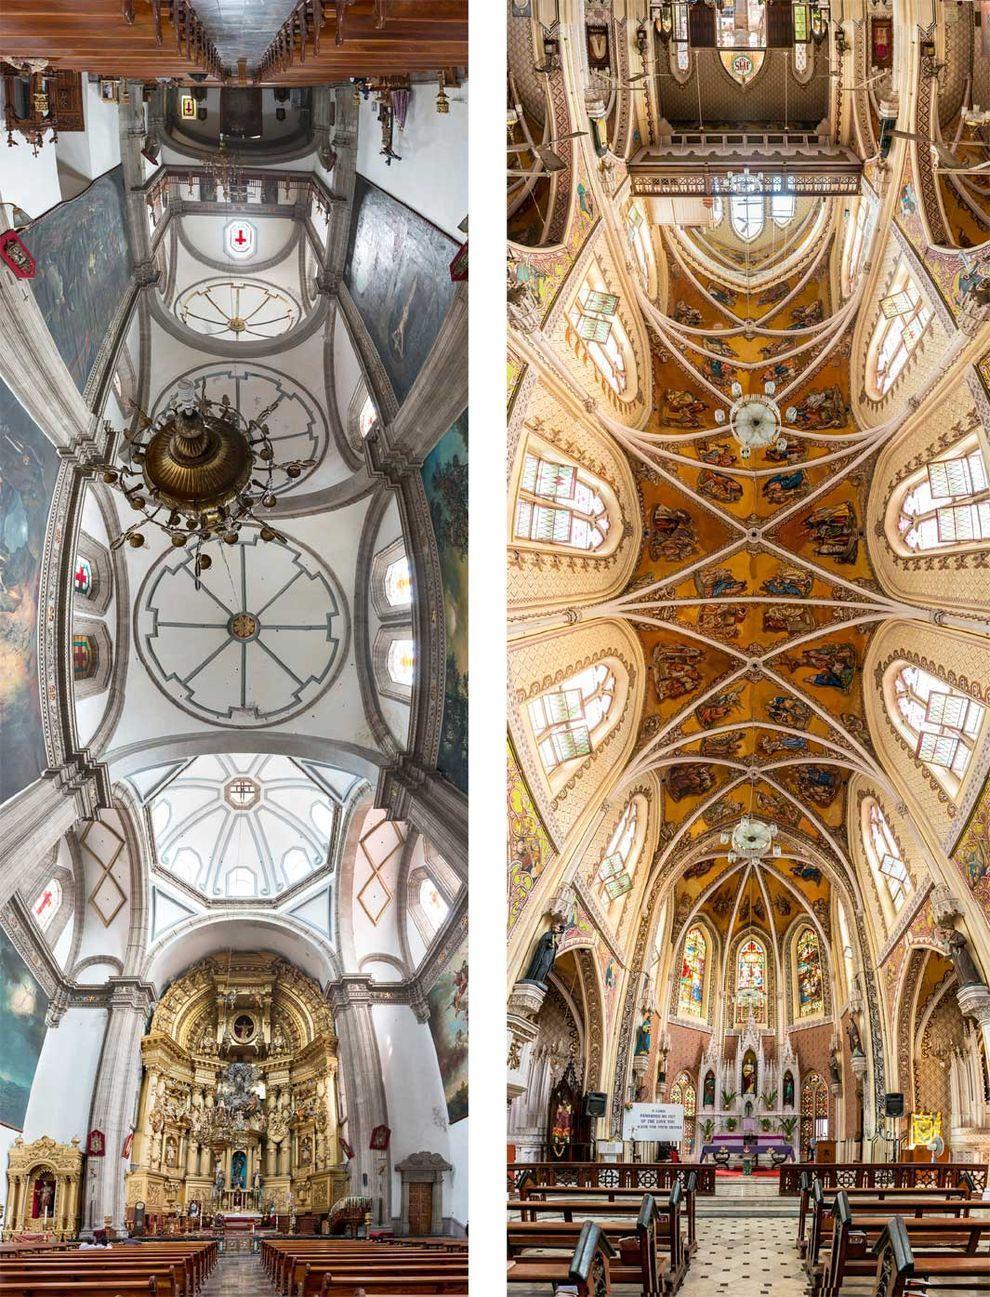 Слева: церковь Сан-Франциско в Мехико. Справа: собор Святого Духа в Мумбае, Индия.